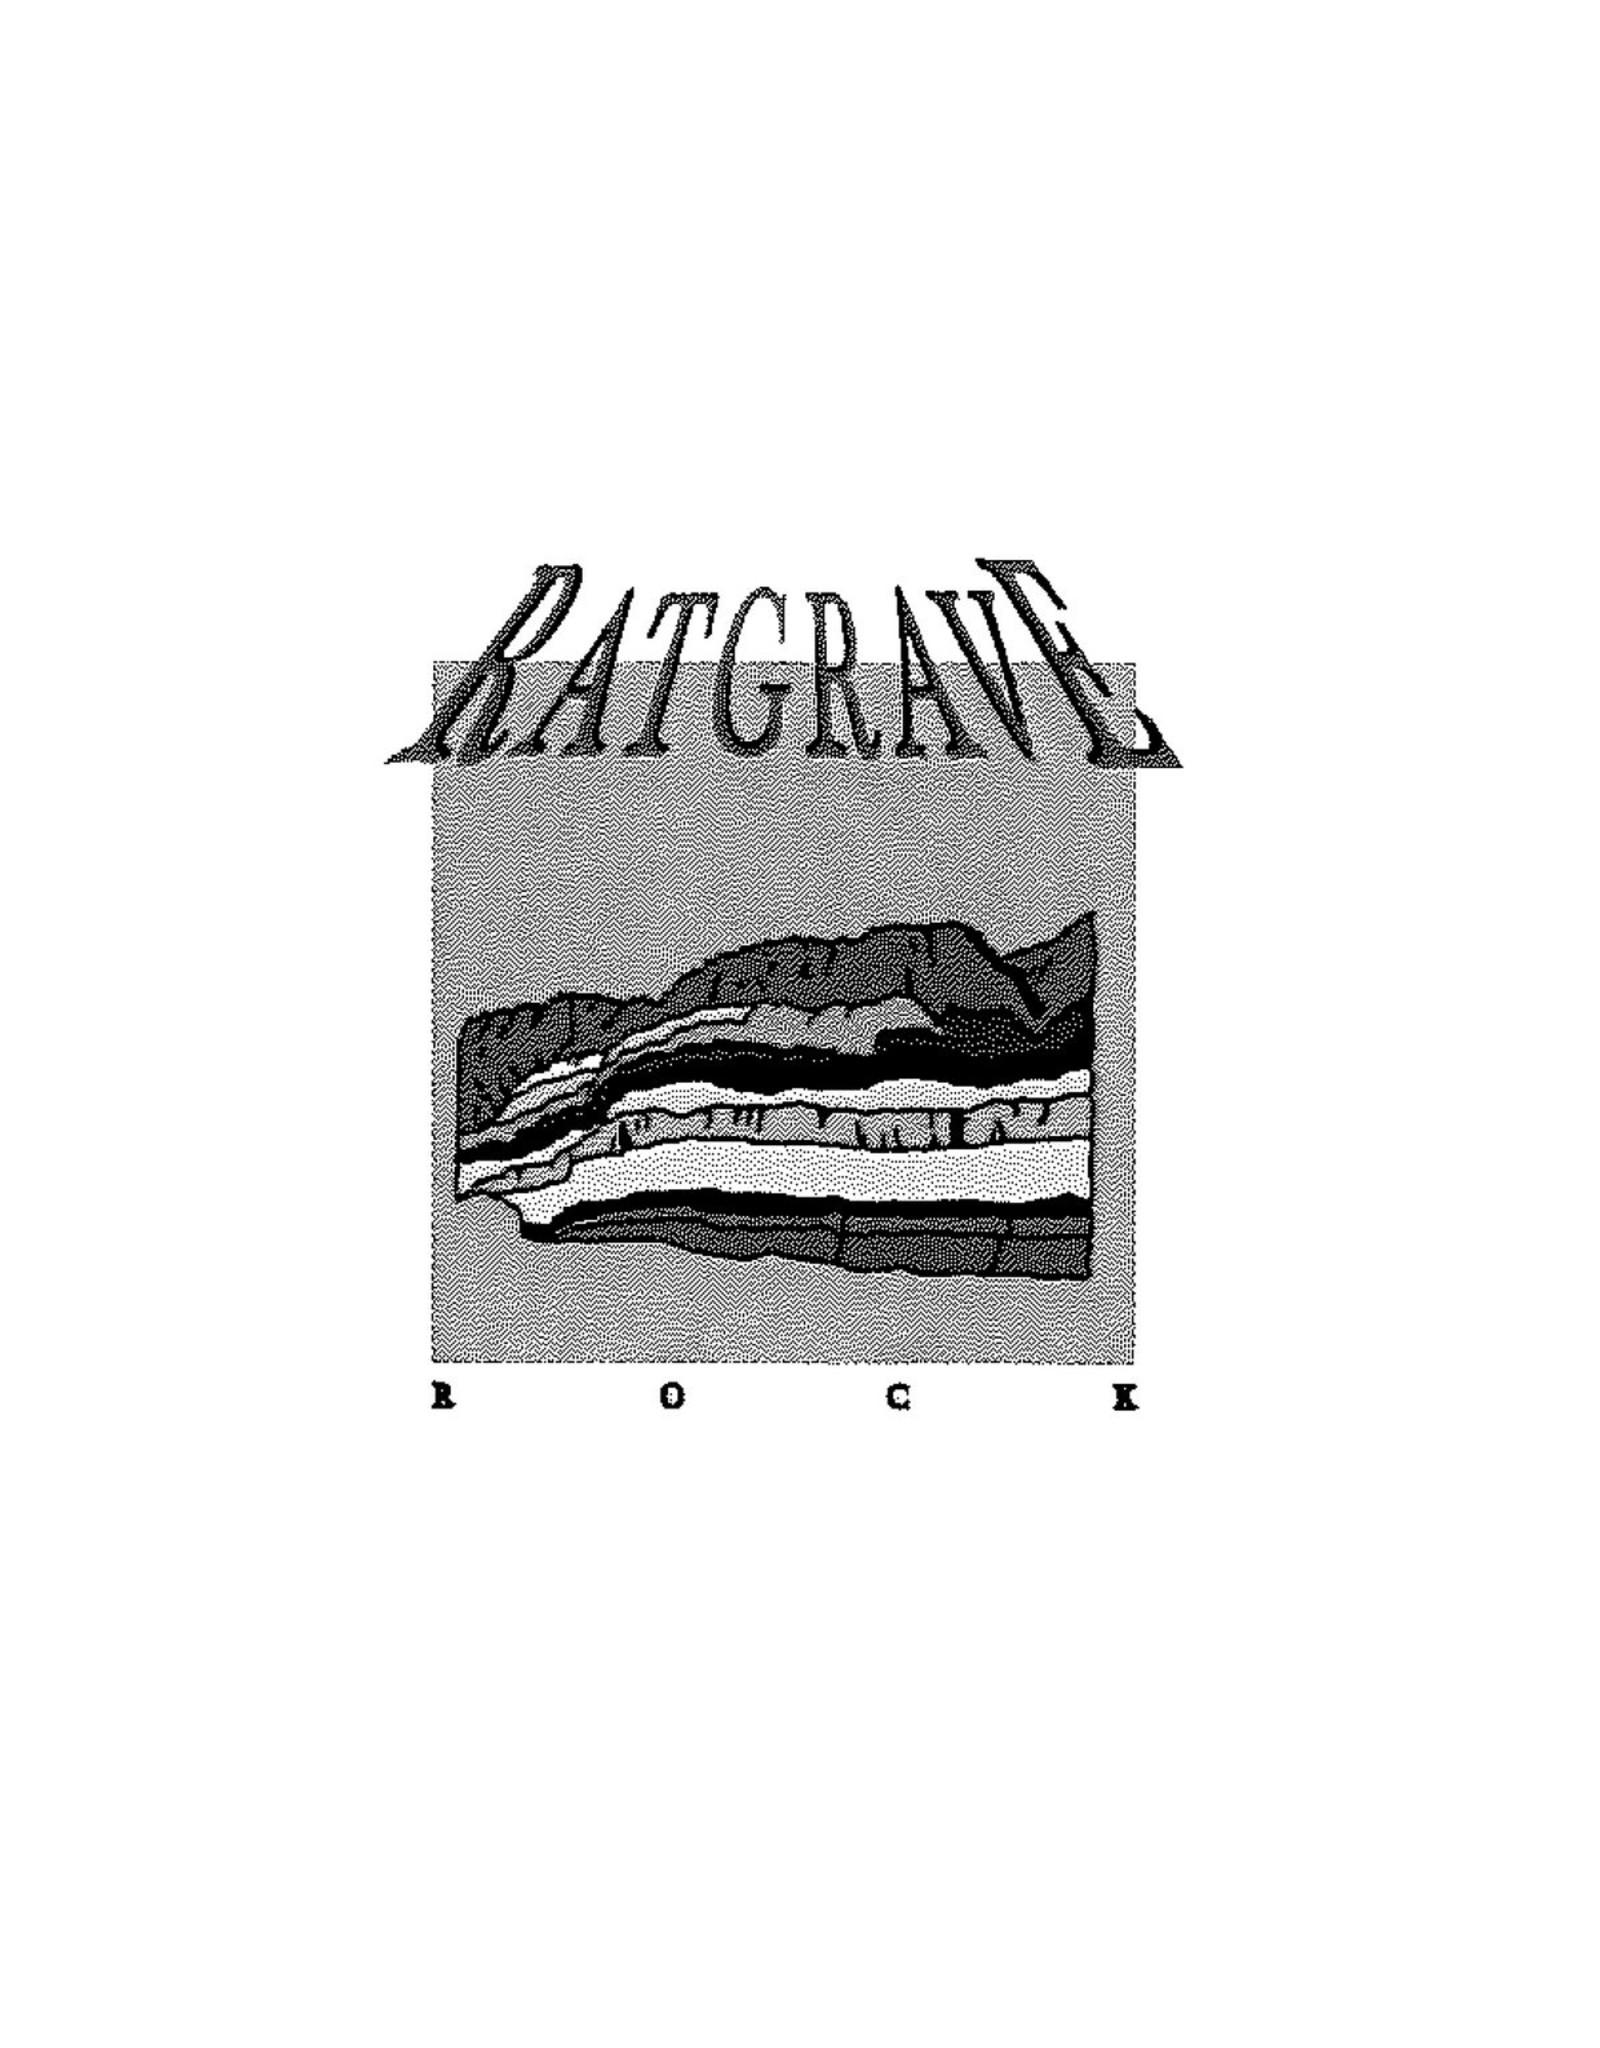 Ratgrave - Rock LP